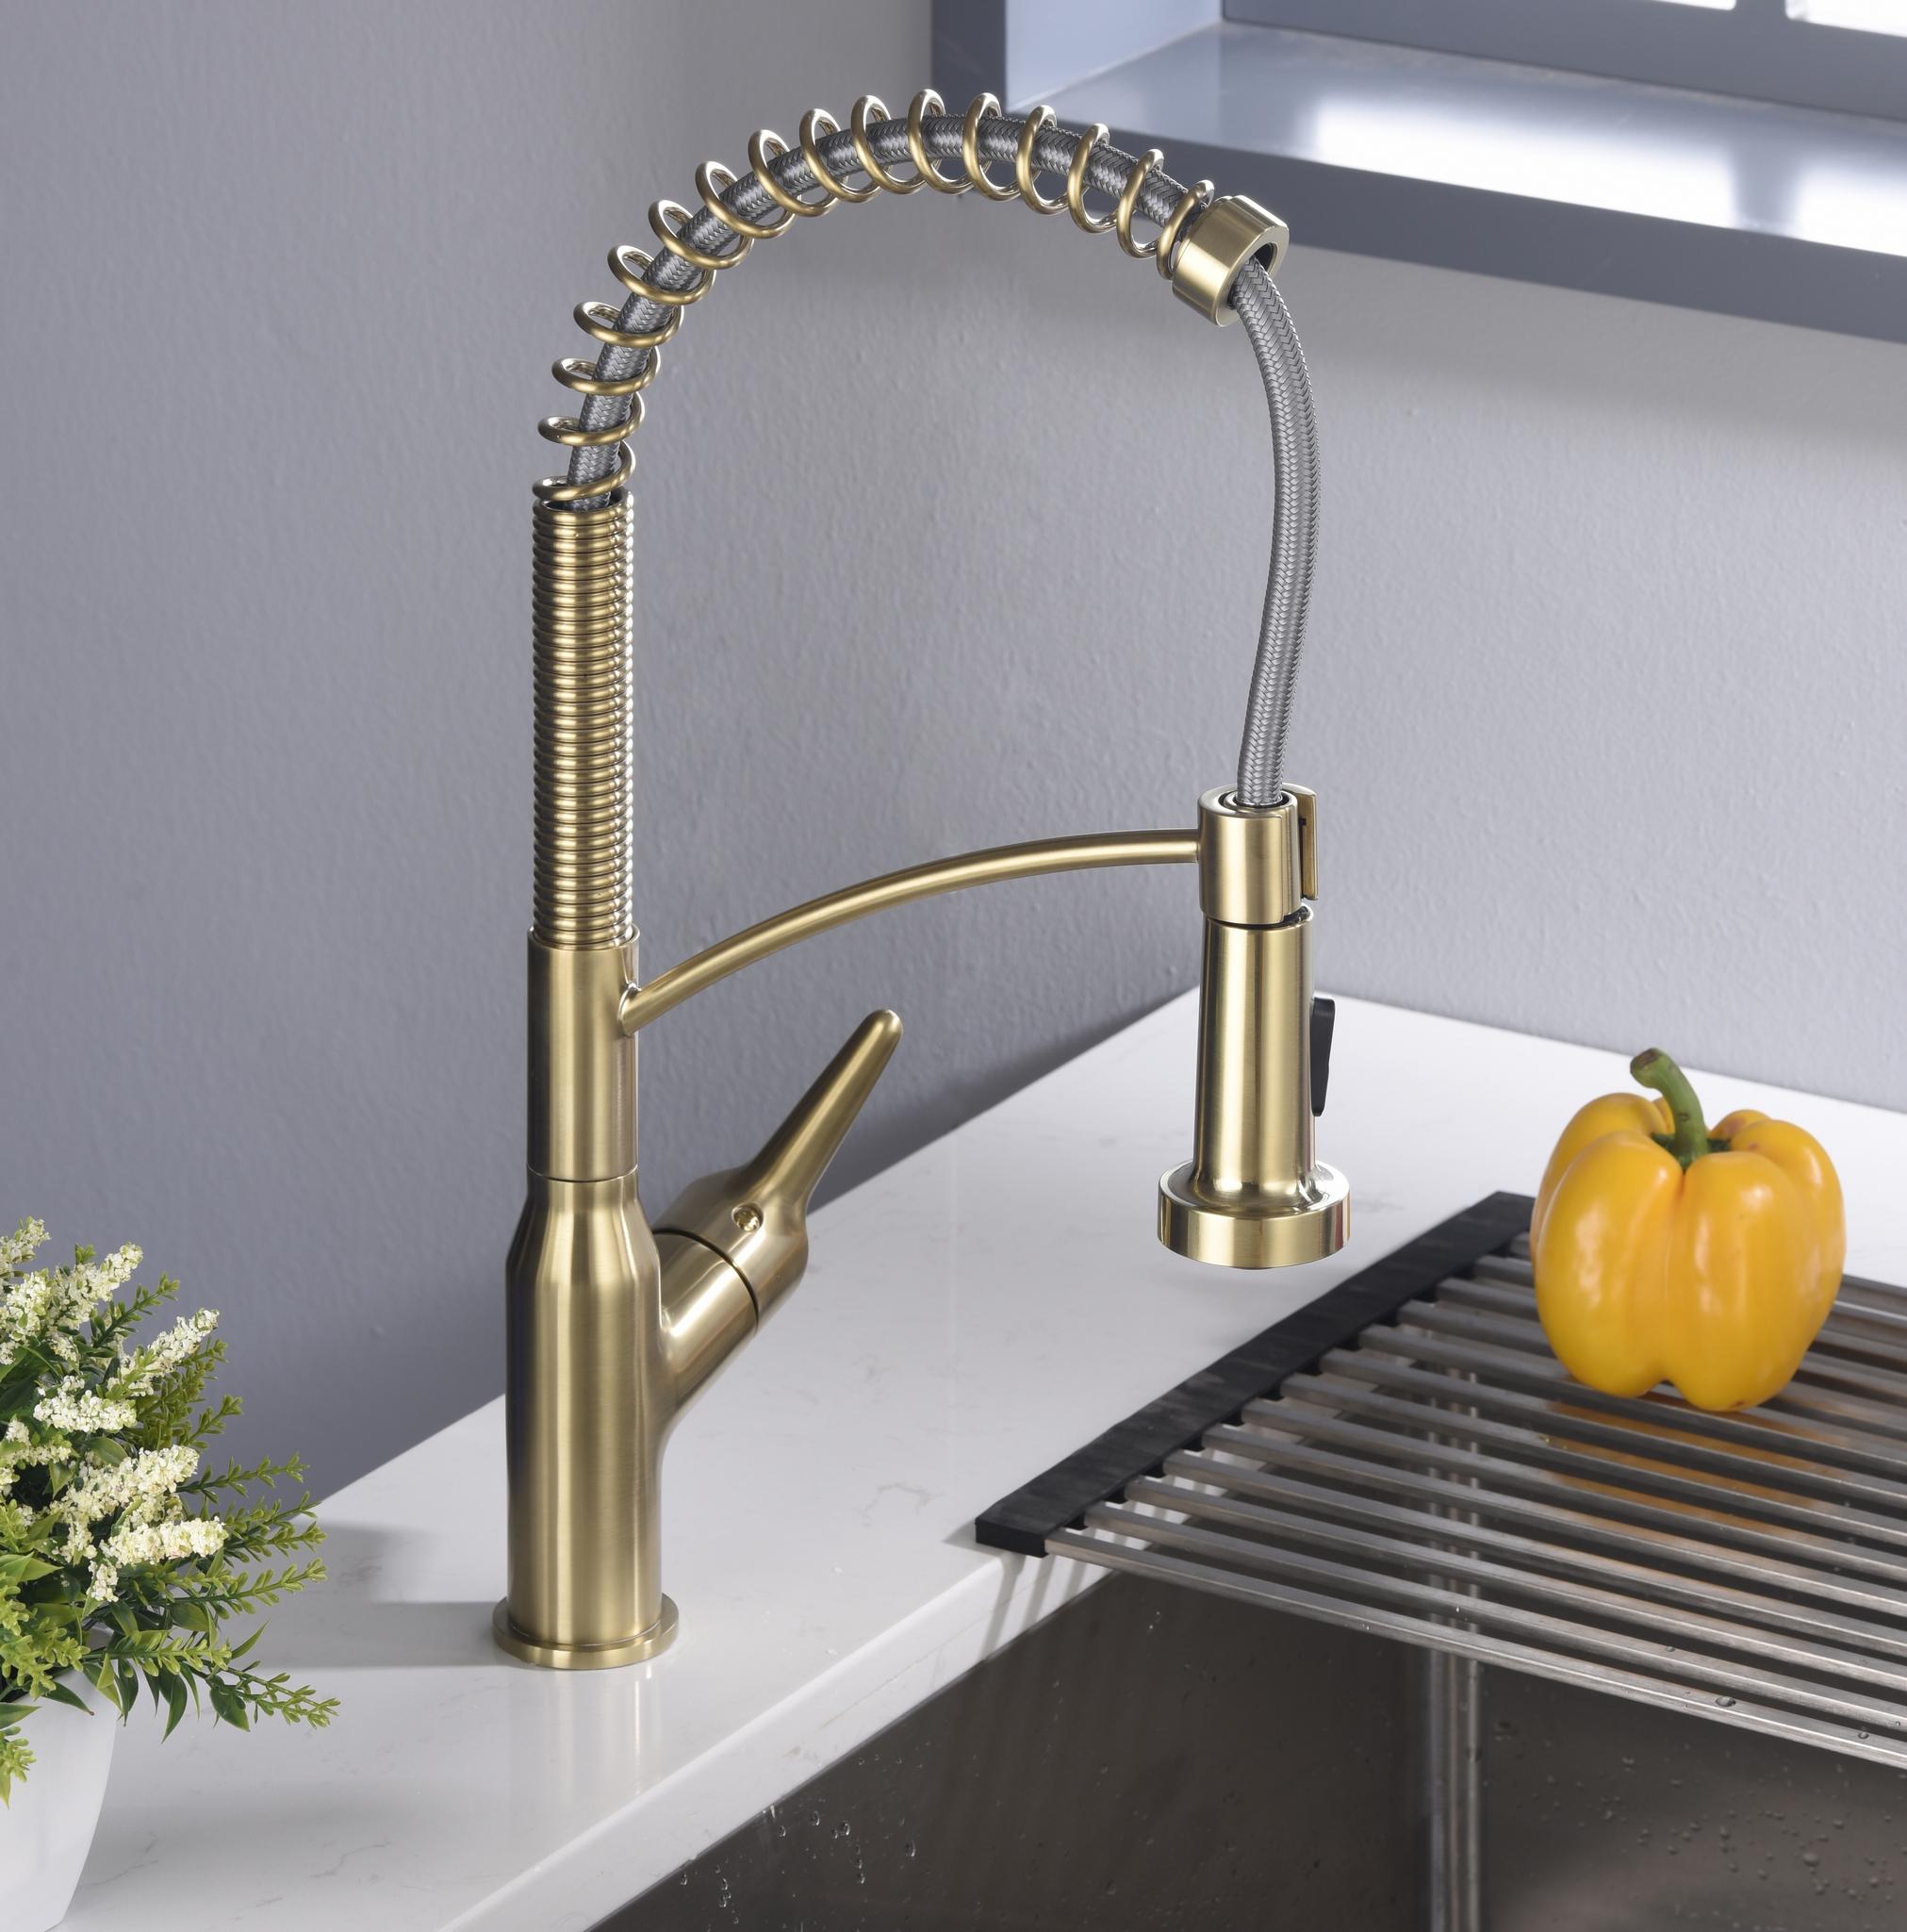 Karran Scottsdale Single Lever Handle Lead-free Brass ADA Kitchen Faucet, Pull Down, Brushed Gold, KKF210BG